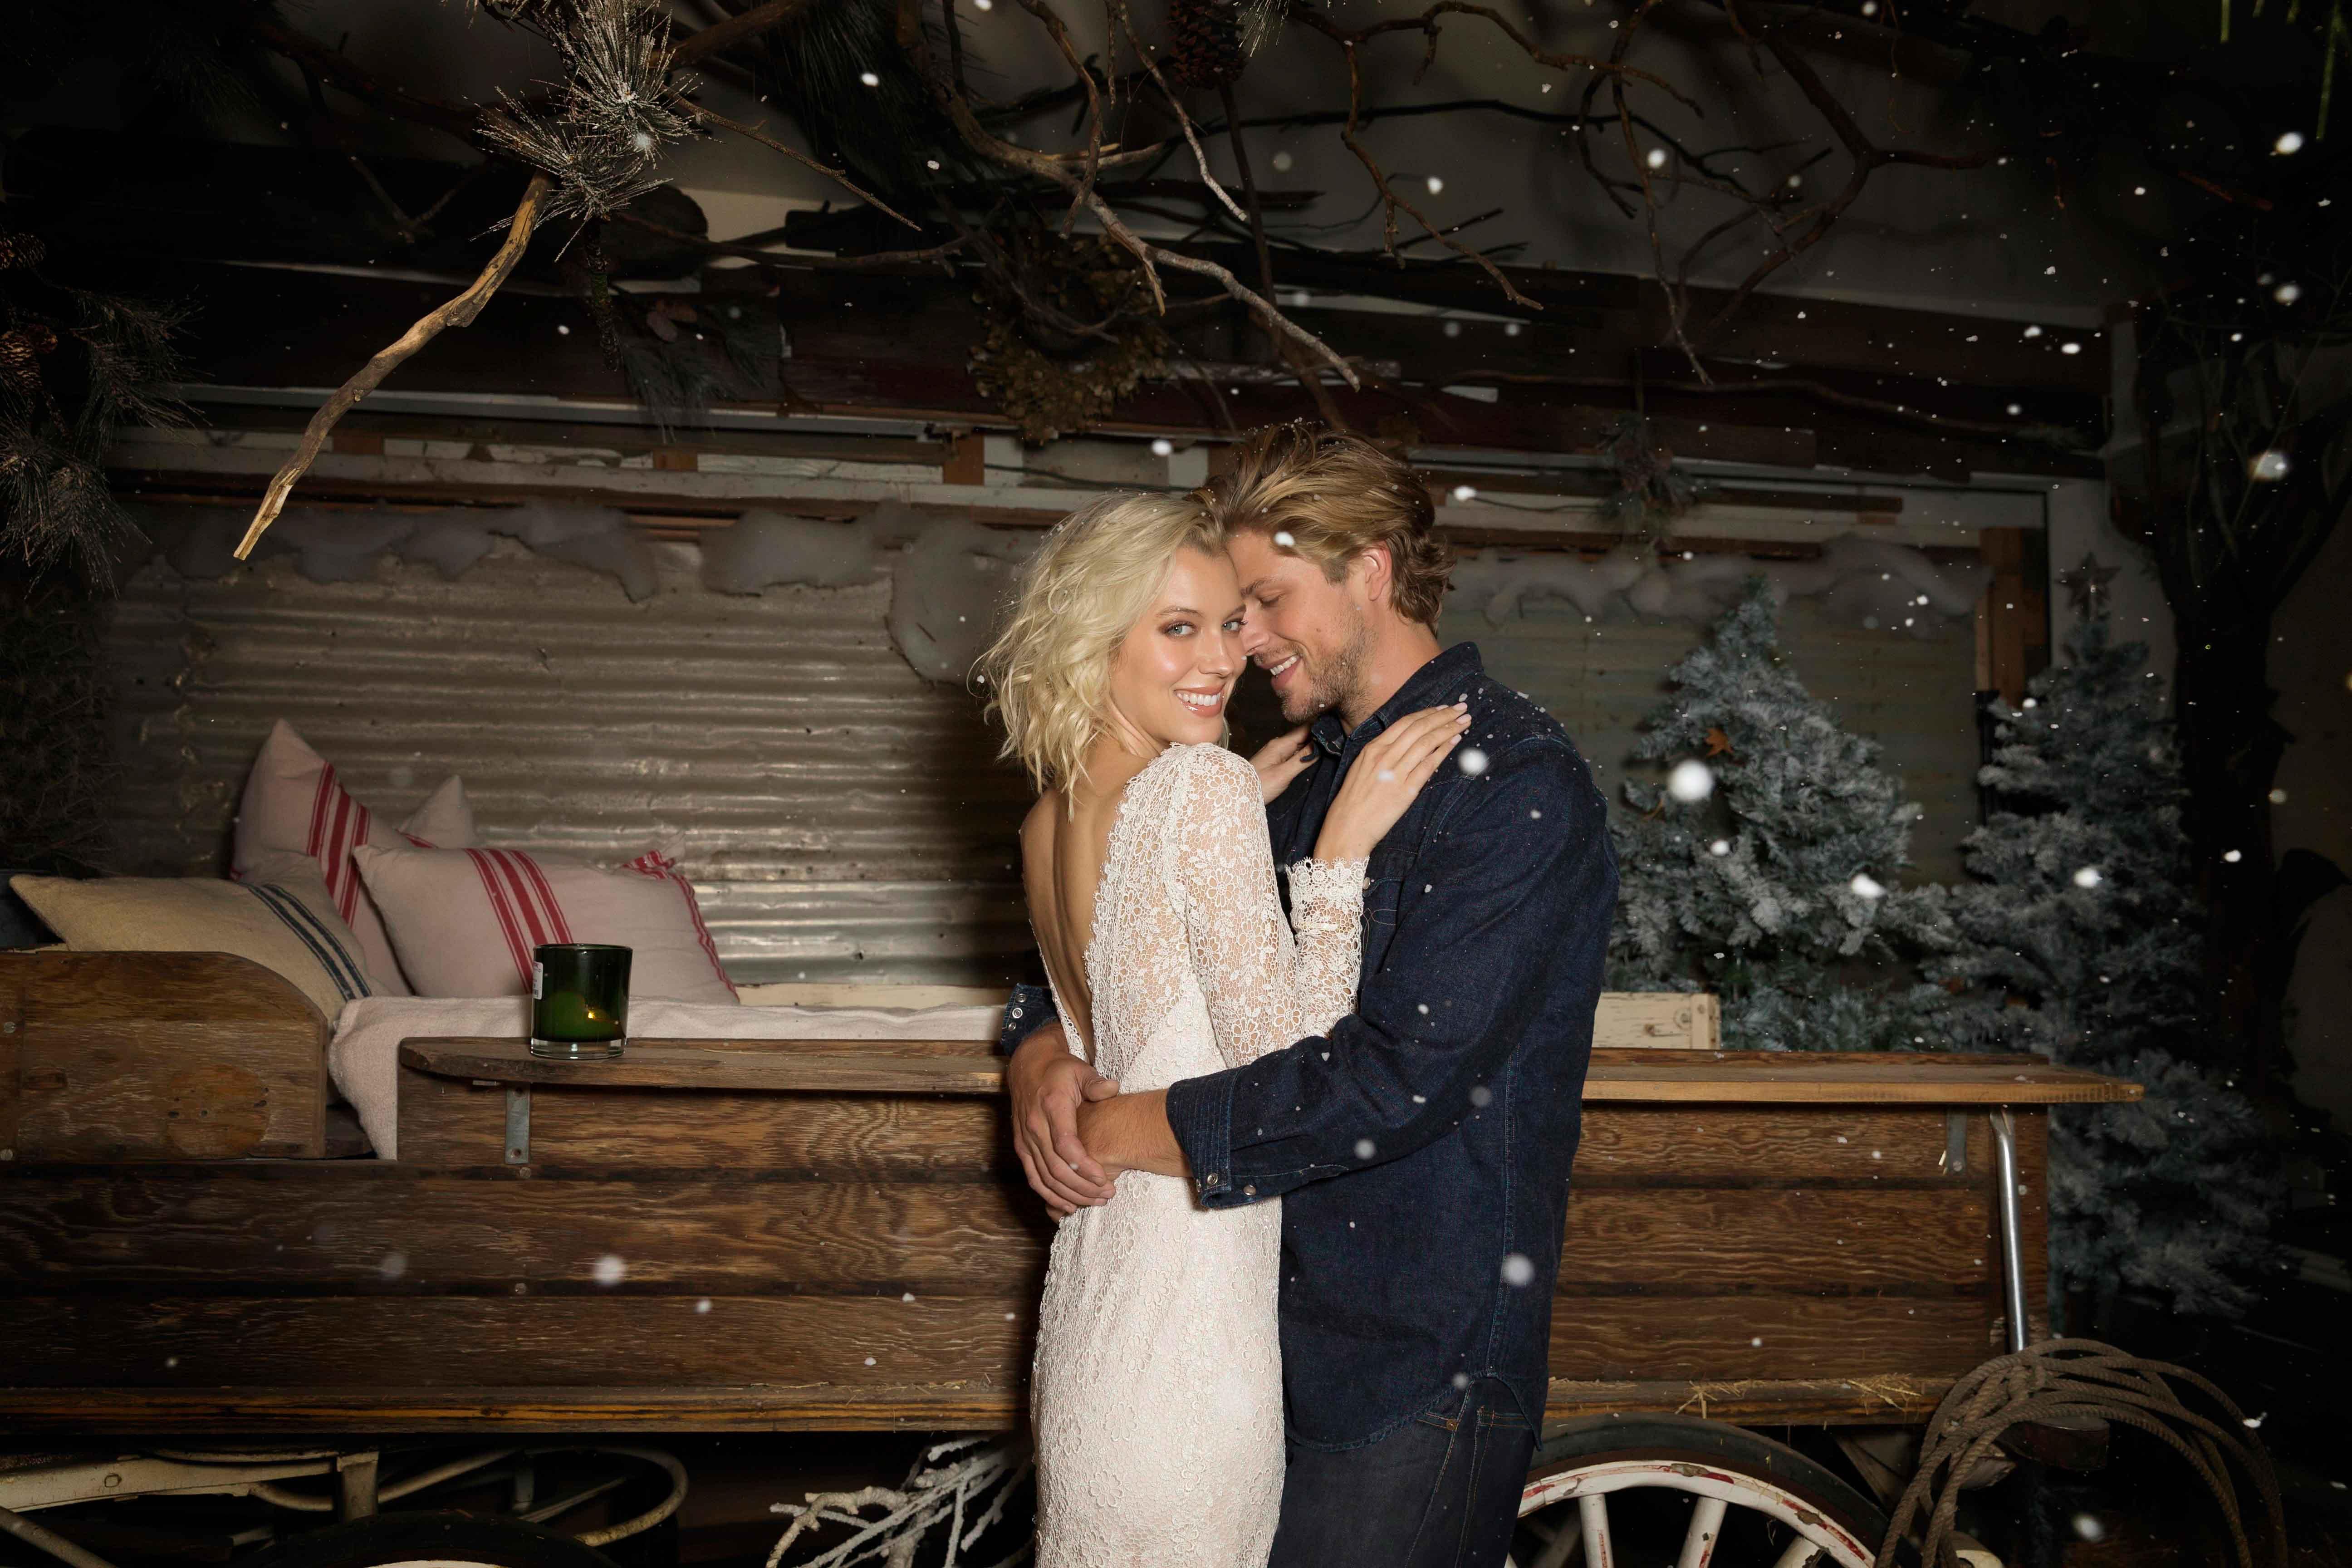 Wedding Photo Ideas Ralph LaurenInspired Wedding